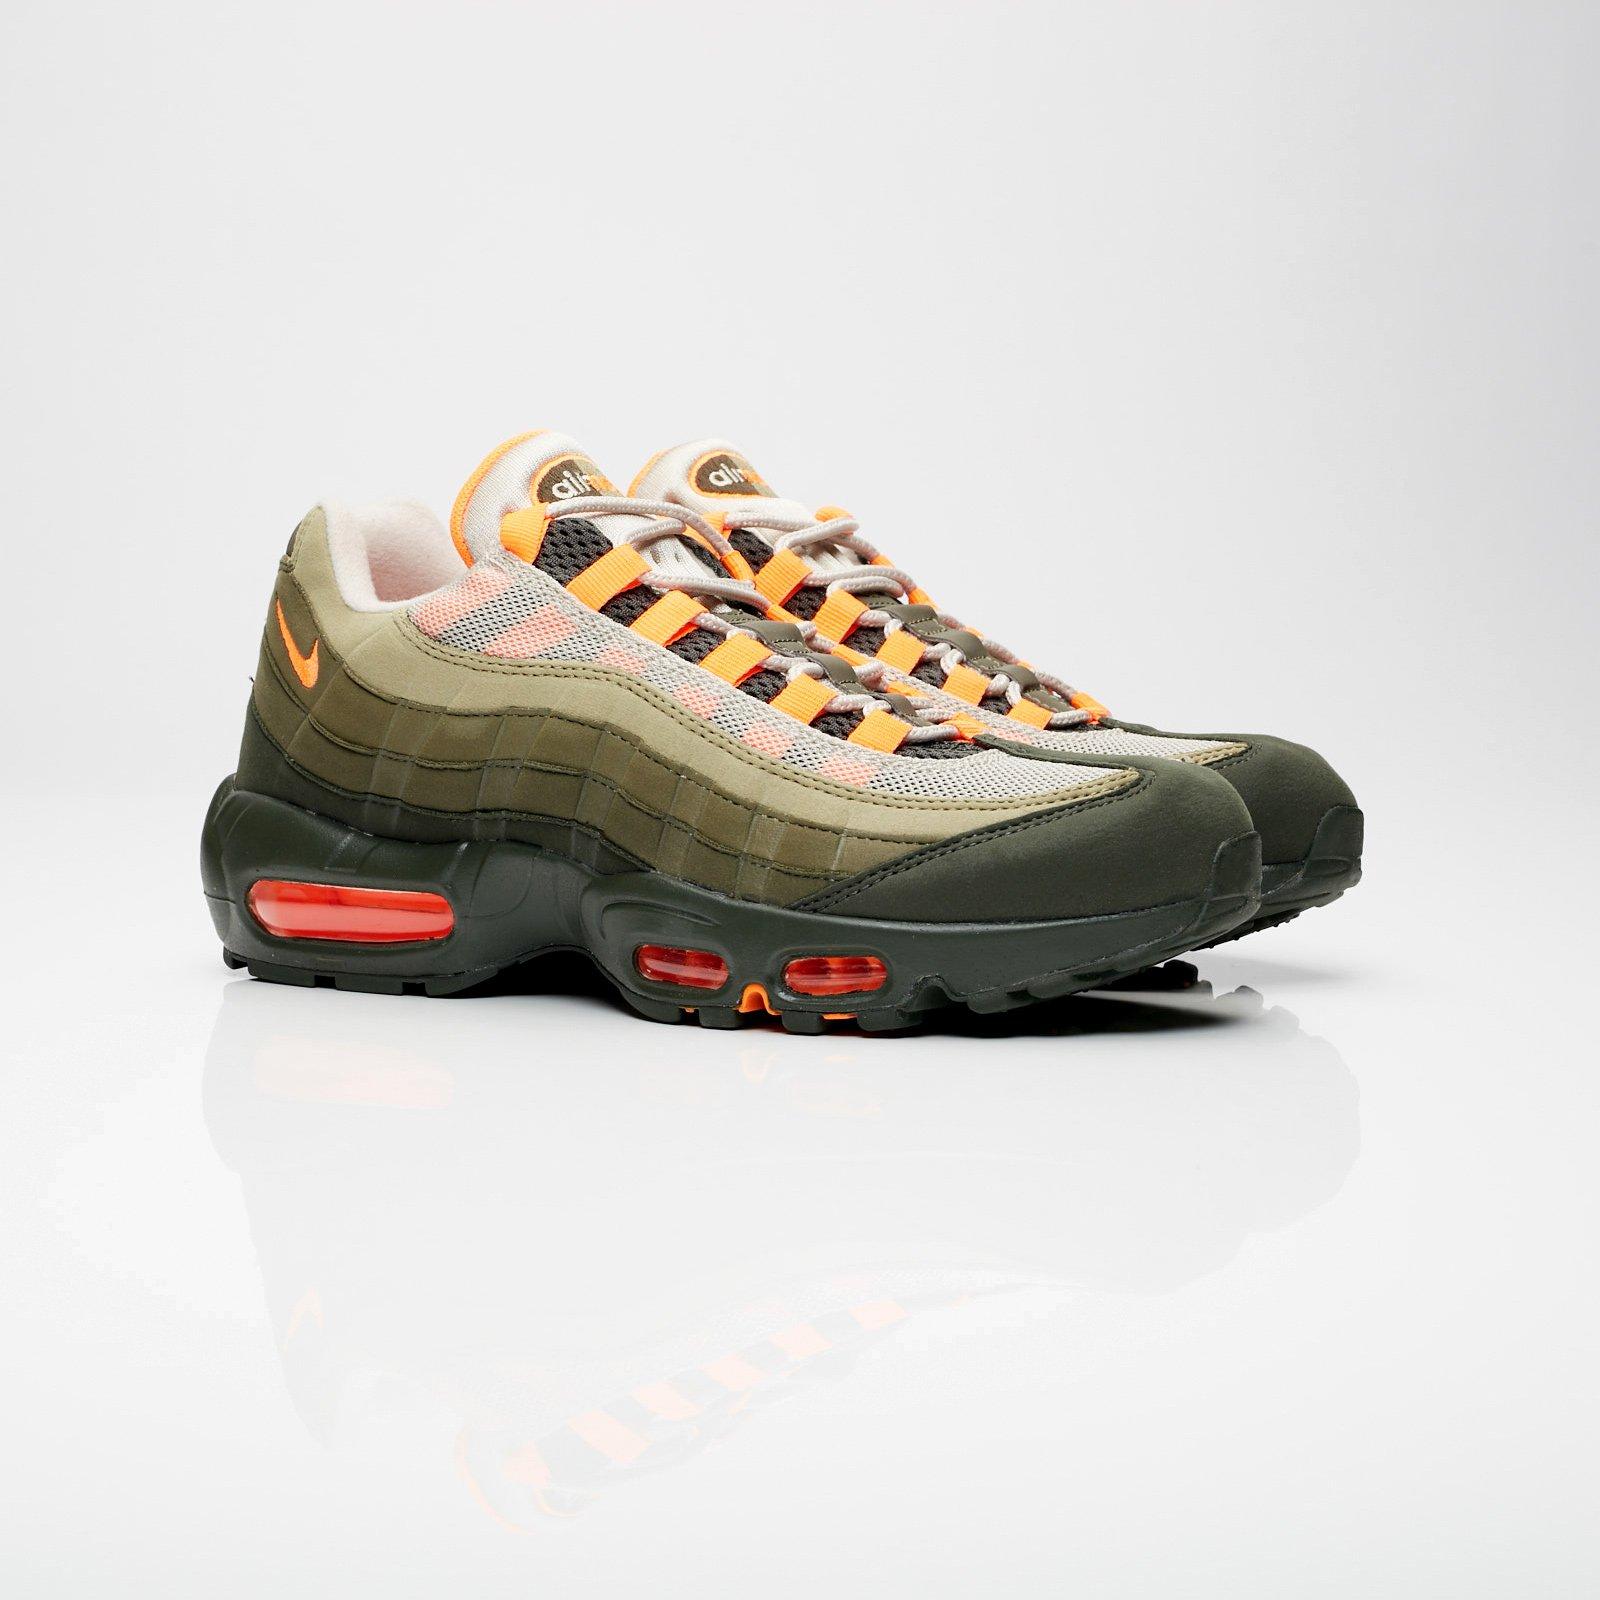 48c51a8ec3 Nike Air Max 95 OG - At2865-200 - Sneakersnstuff | sneakers ...